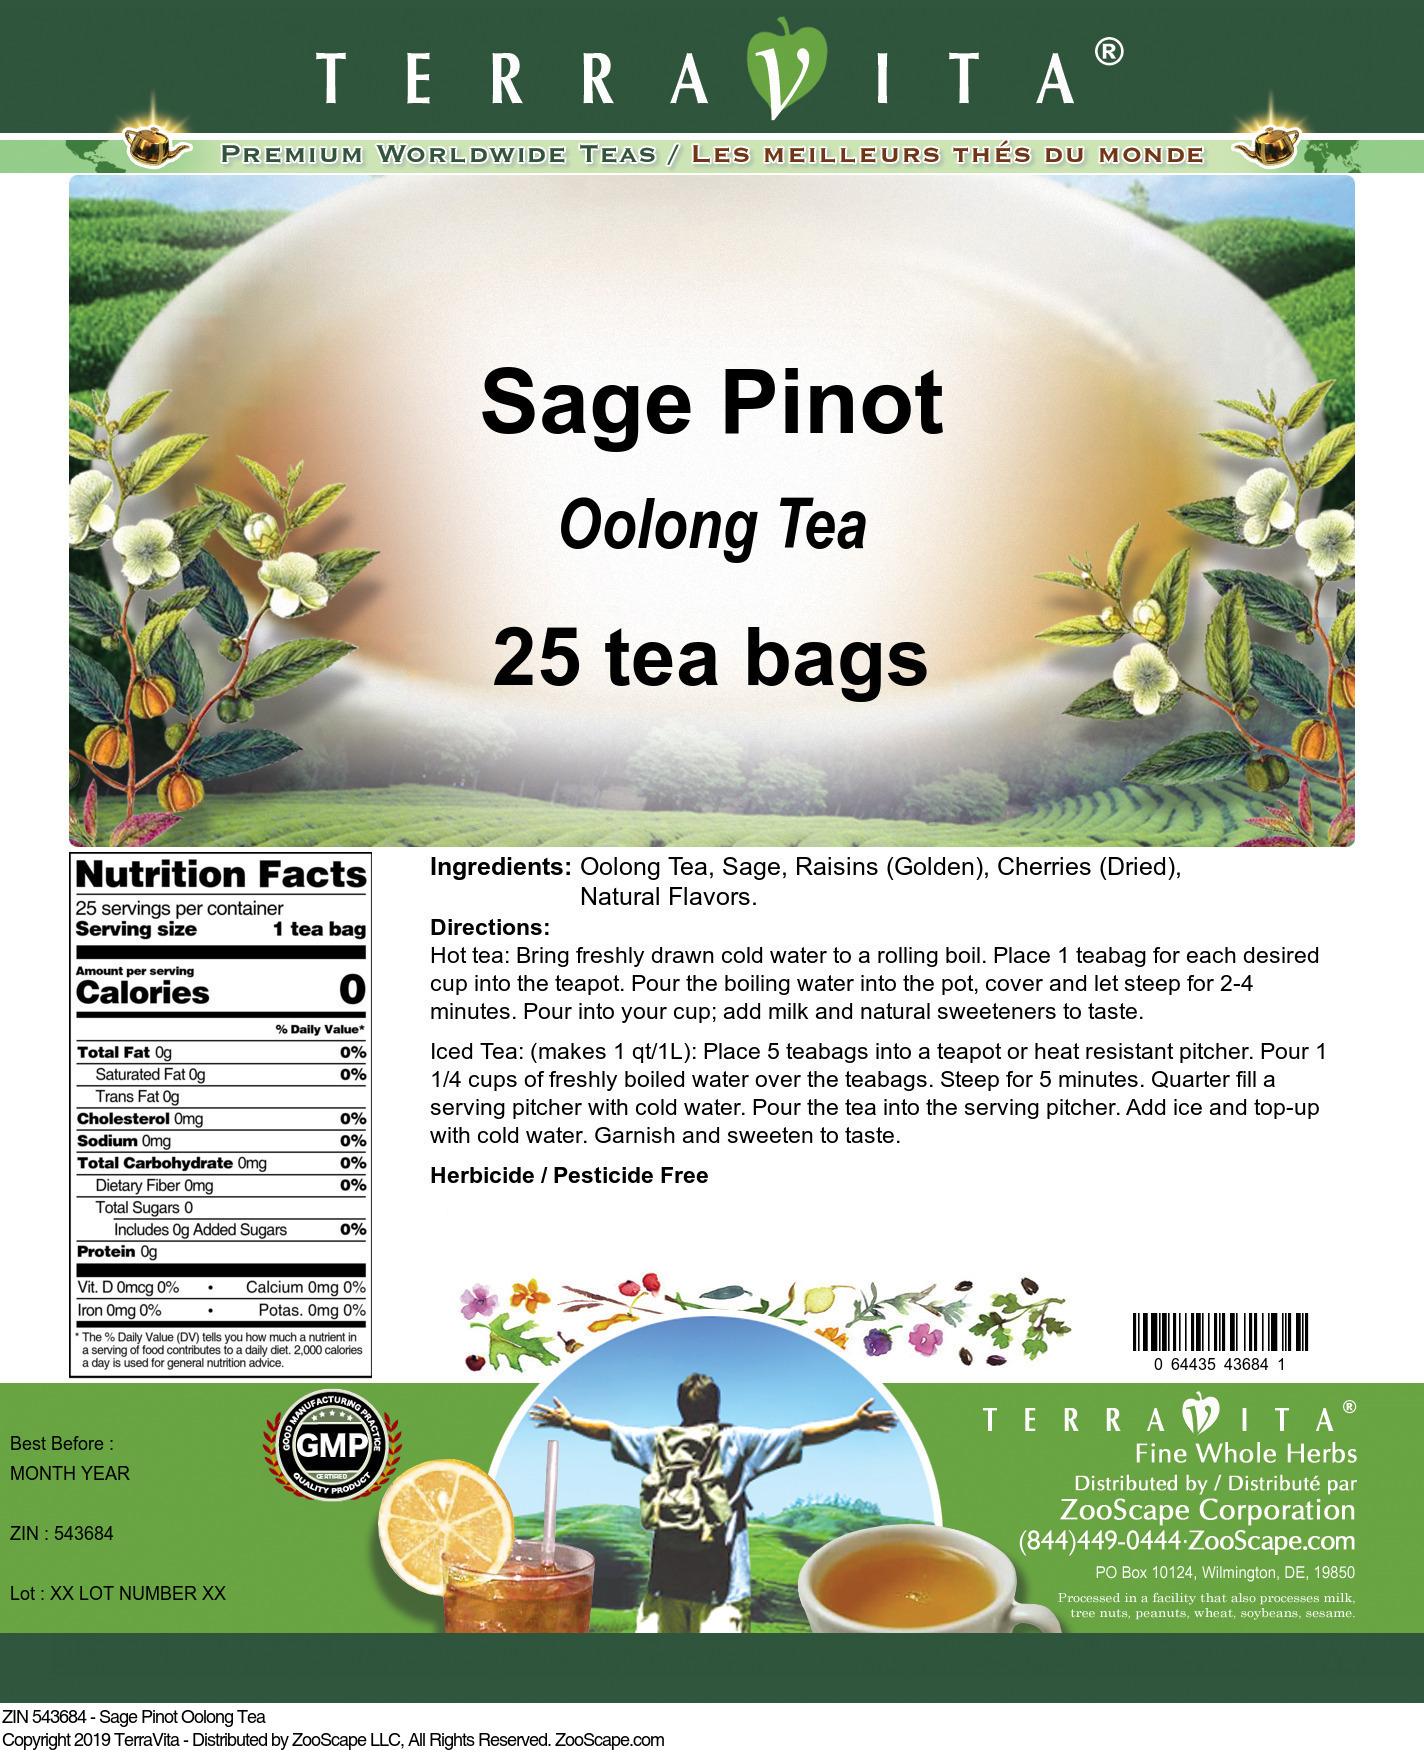 Sage Pinot Oolong Tea